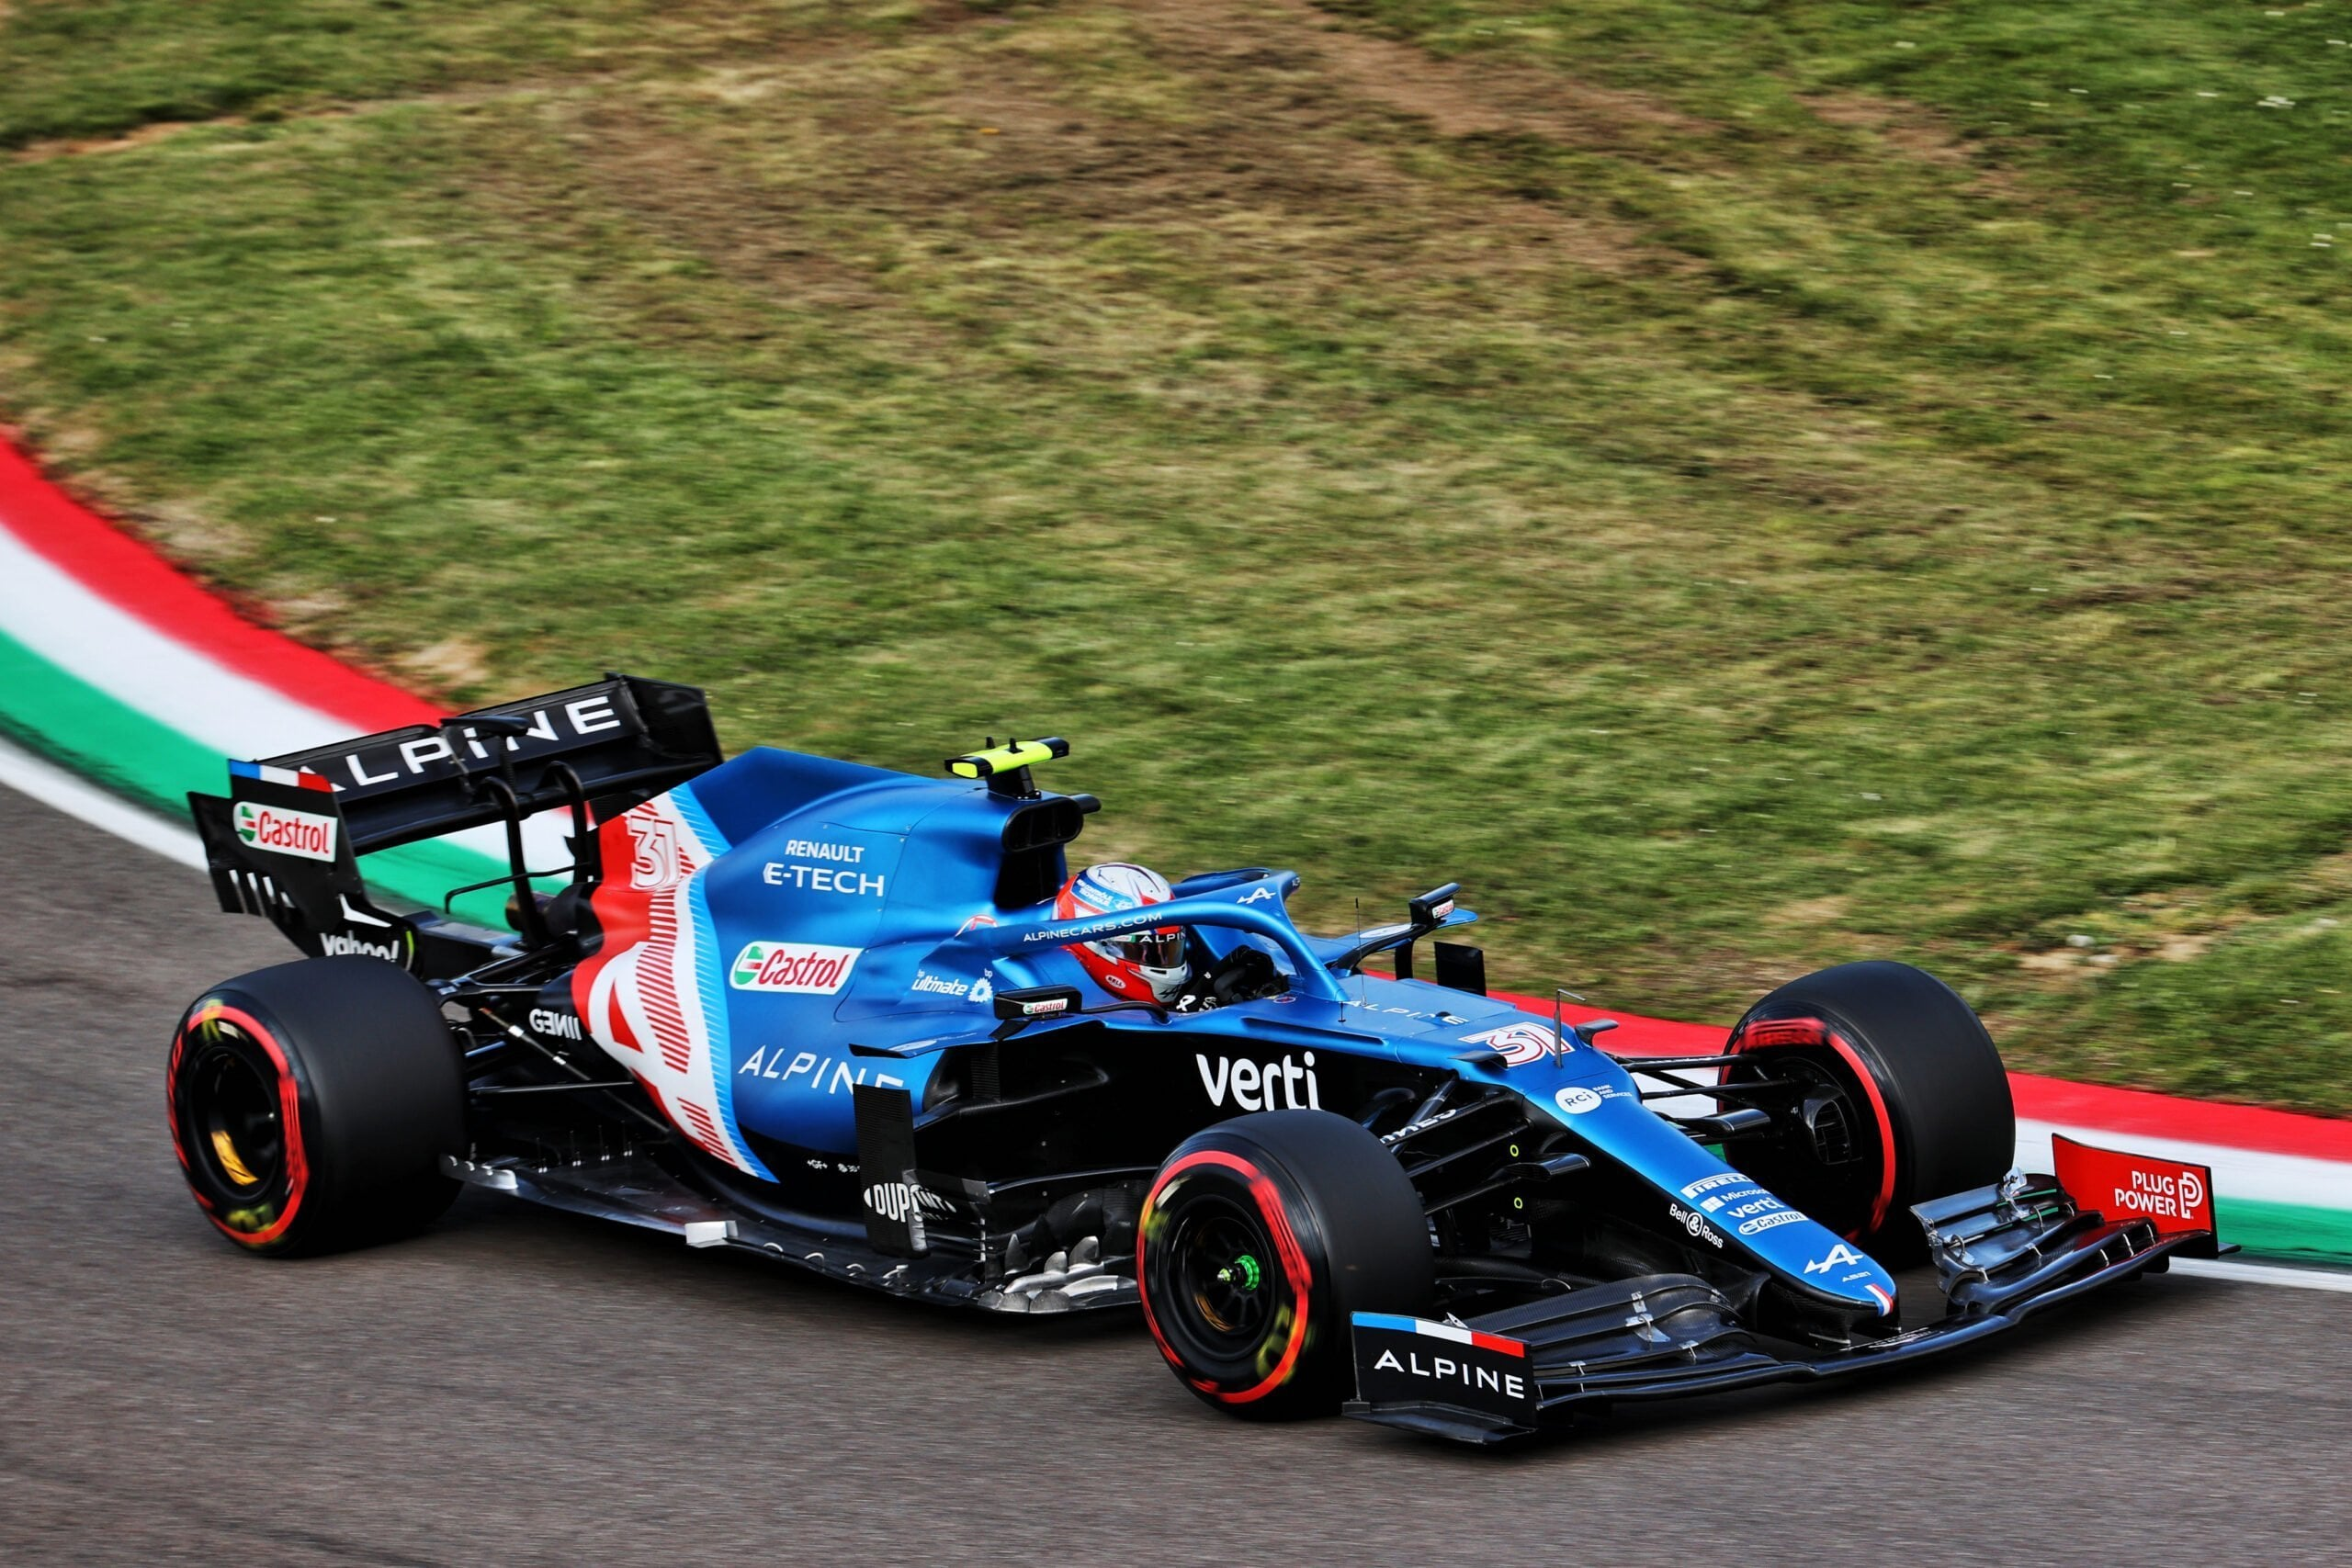 Alpine F1 Team A521 Alonso Ocon Brivio Permane Imola 2021 Test 7 scaled   Alpine F1 Team en milieu de peloton aux essais à Imola